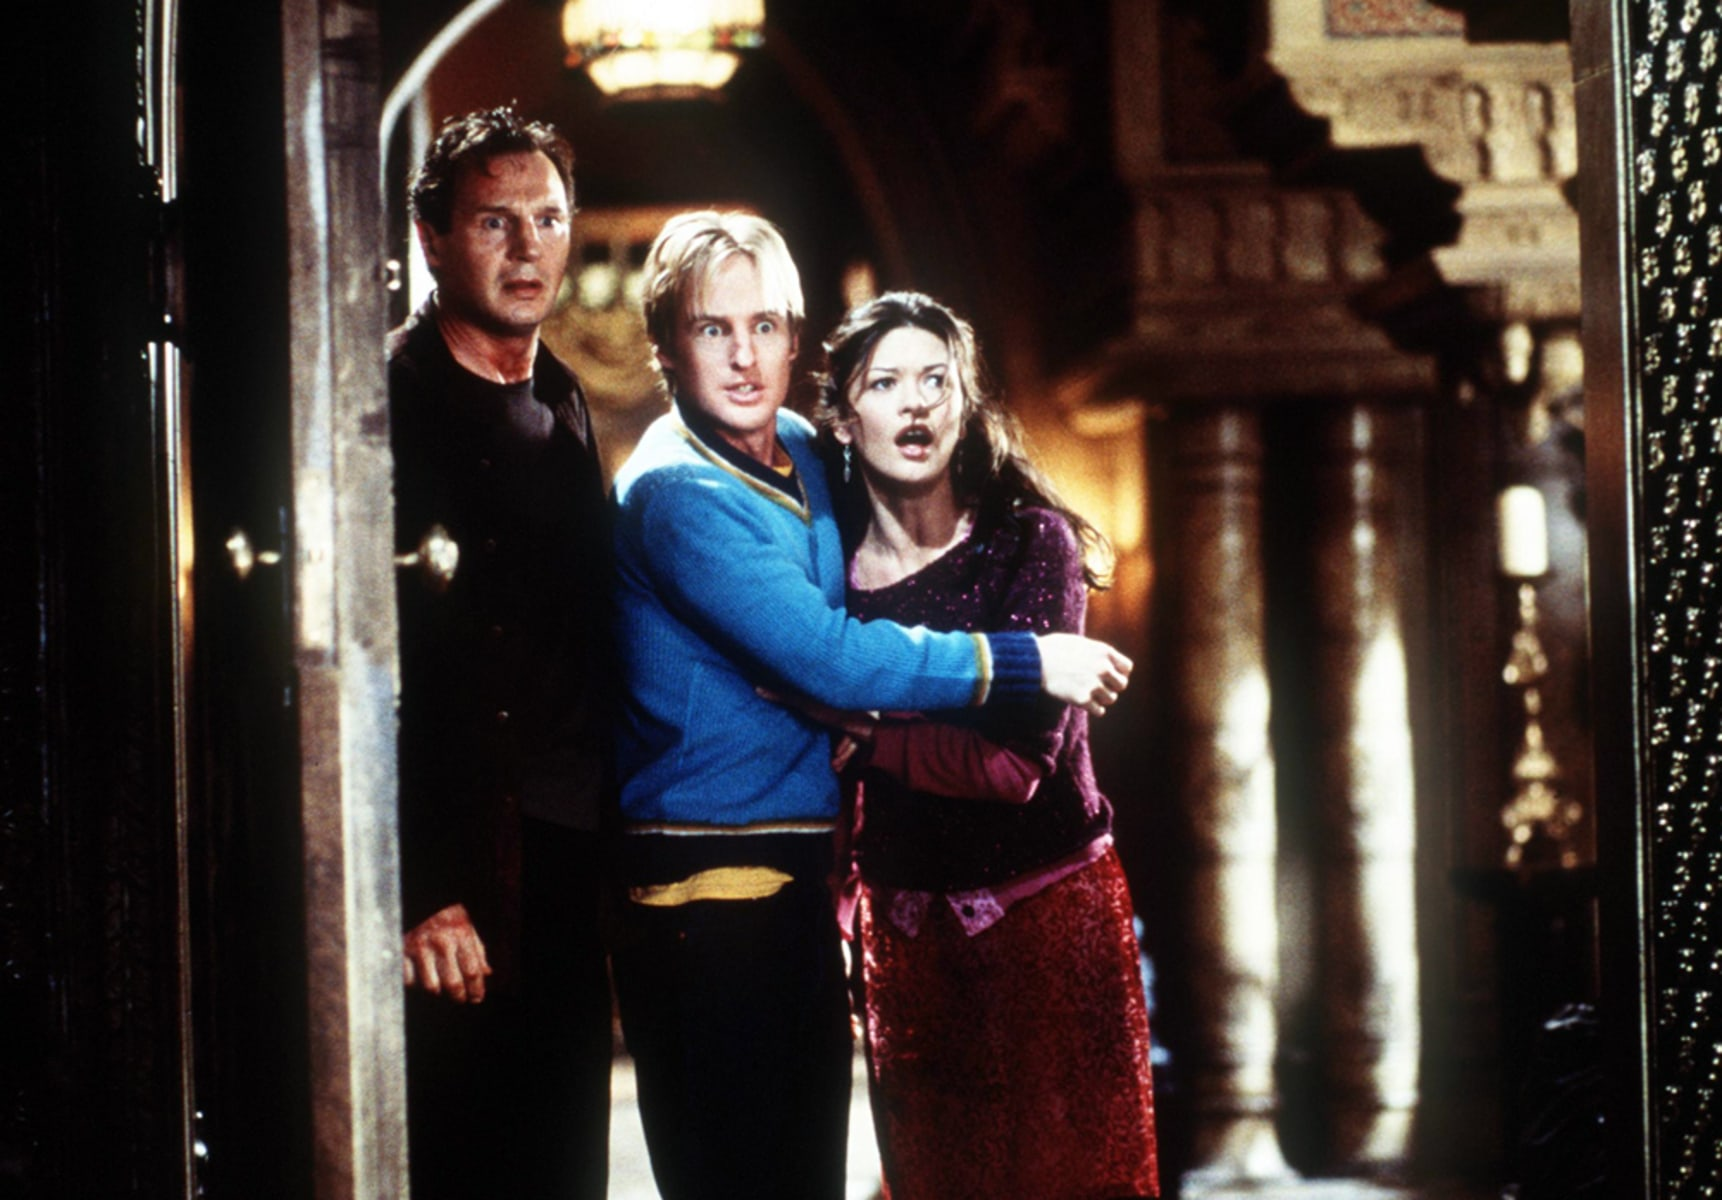 Dr David Marrow (Liam Neeson Luke (Owen Wilson And Theo (Catherine Zeta Jones Watch In Horror A